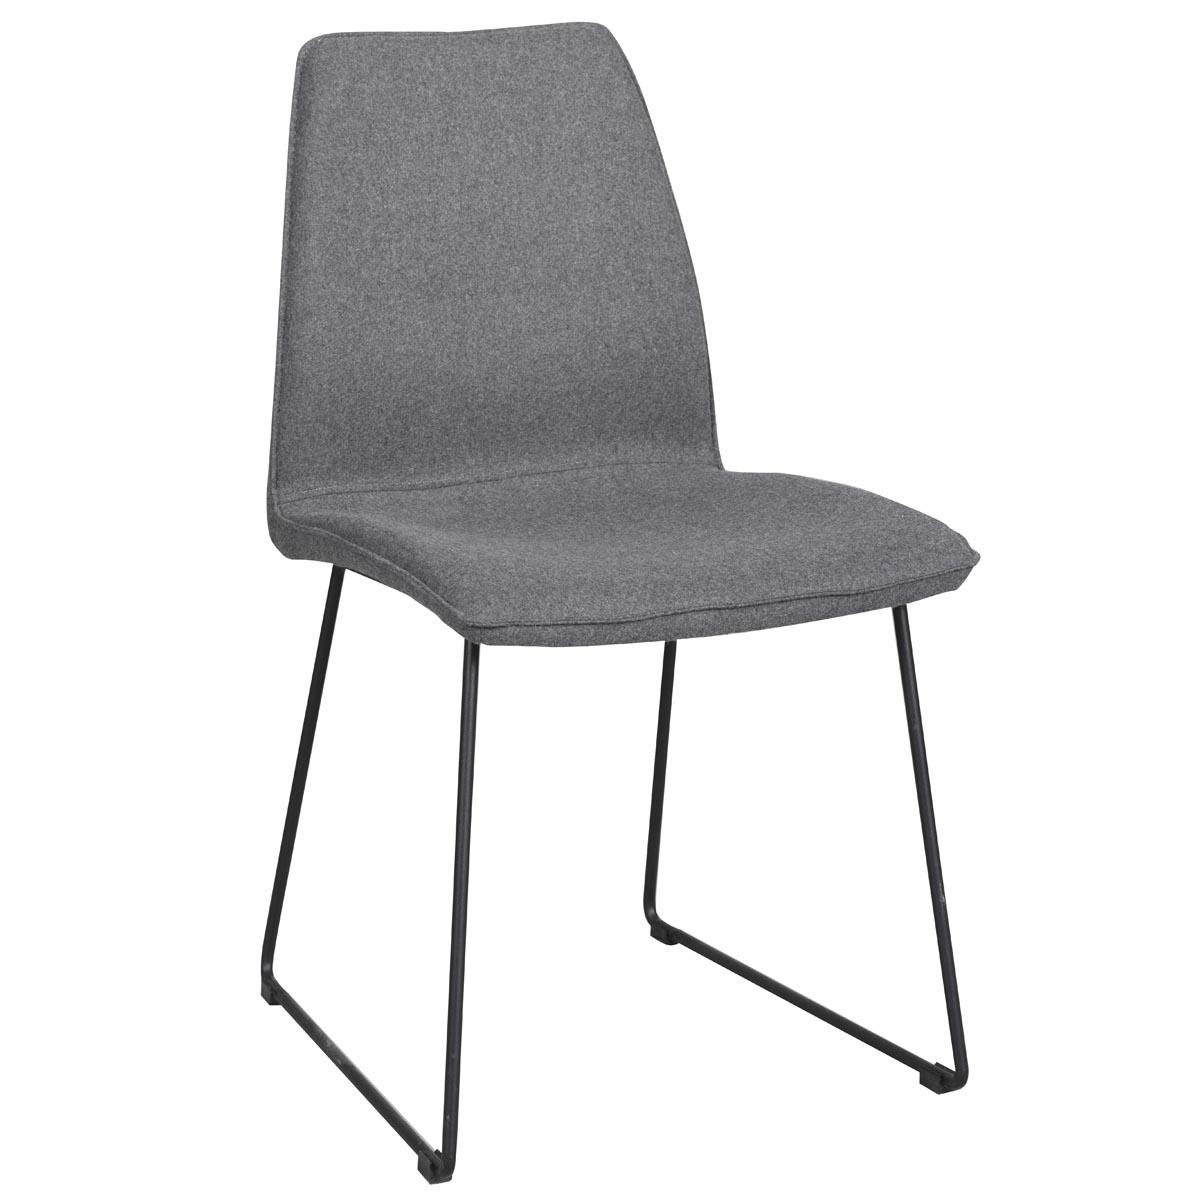 Fairbanks stol mörkgrå med svarta metallben vinkel